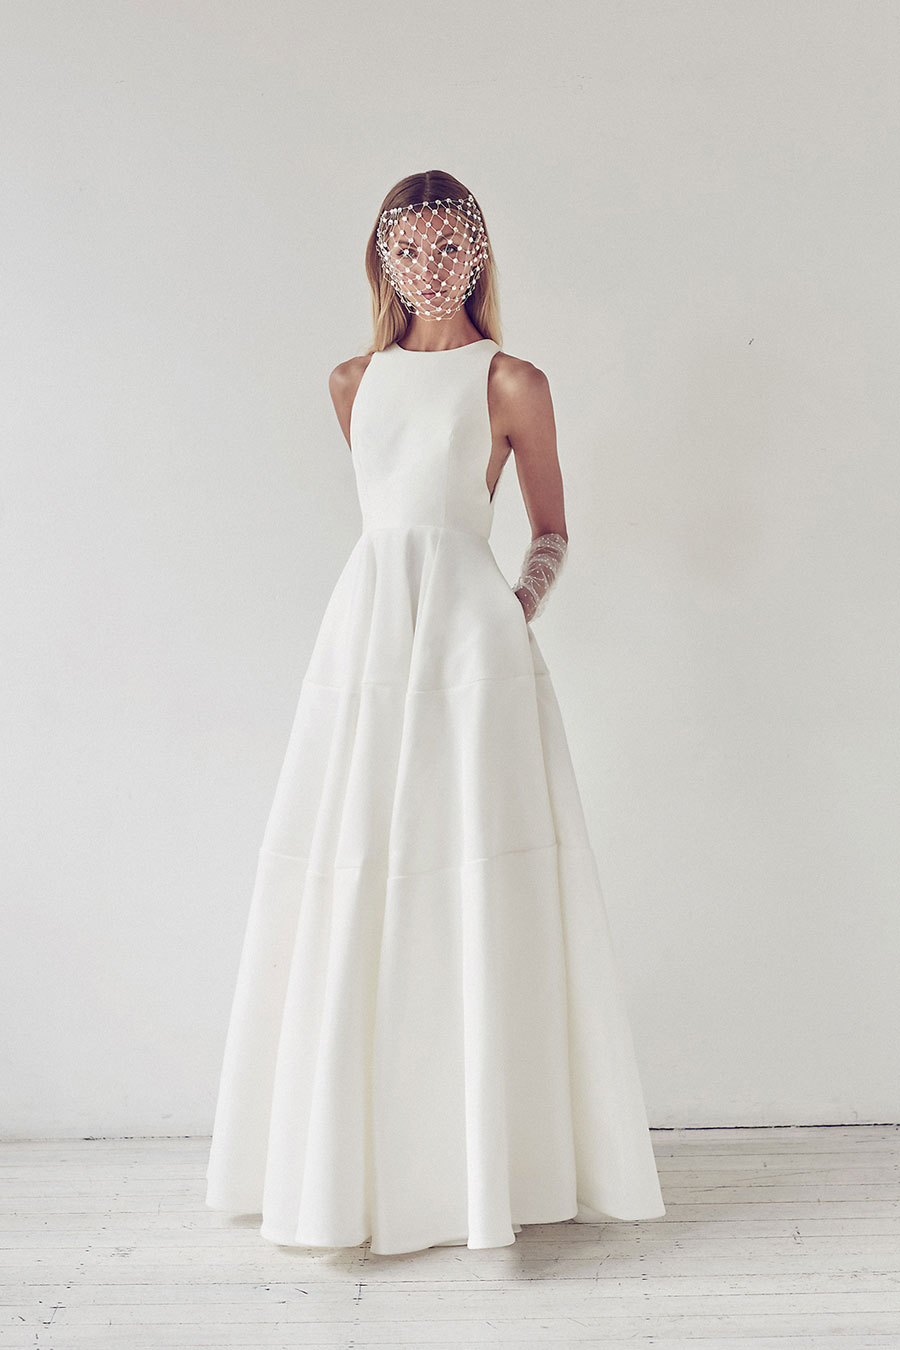 Suzanne Harward Galaxy Wedding Dress | Love Find Co.